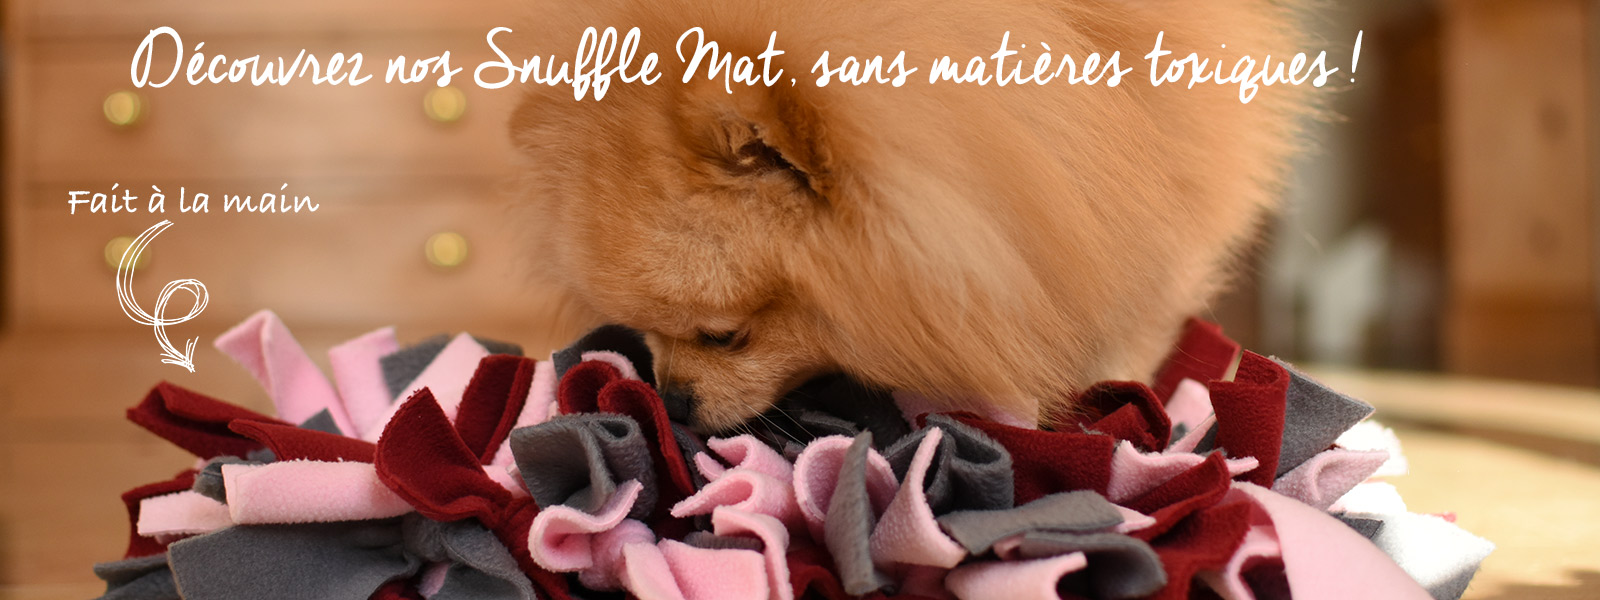 Snuffle mat ou tapis de fouille